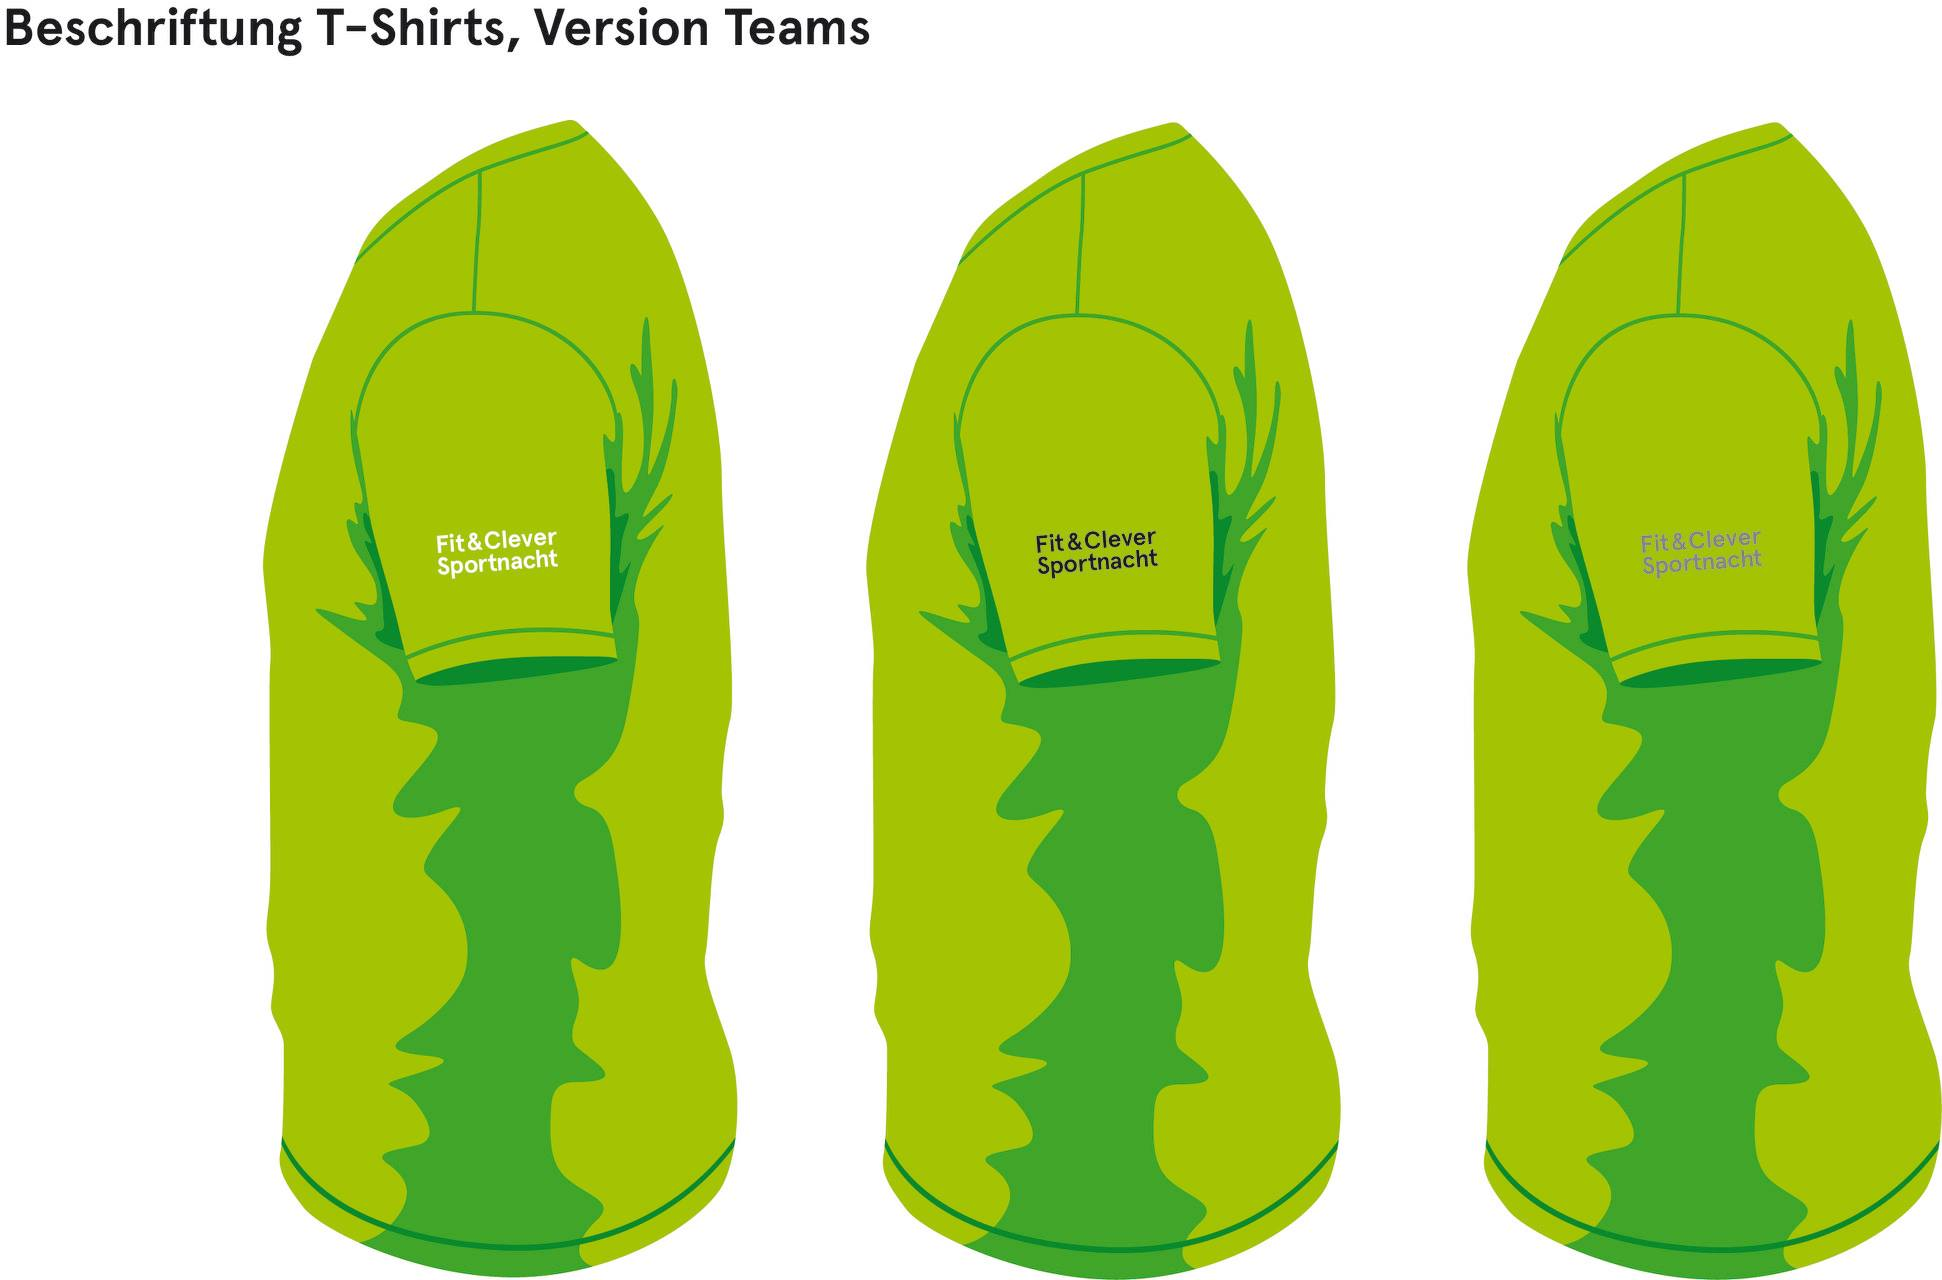 KSSG_Sportnacht2018_Shirts.jpg